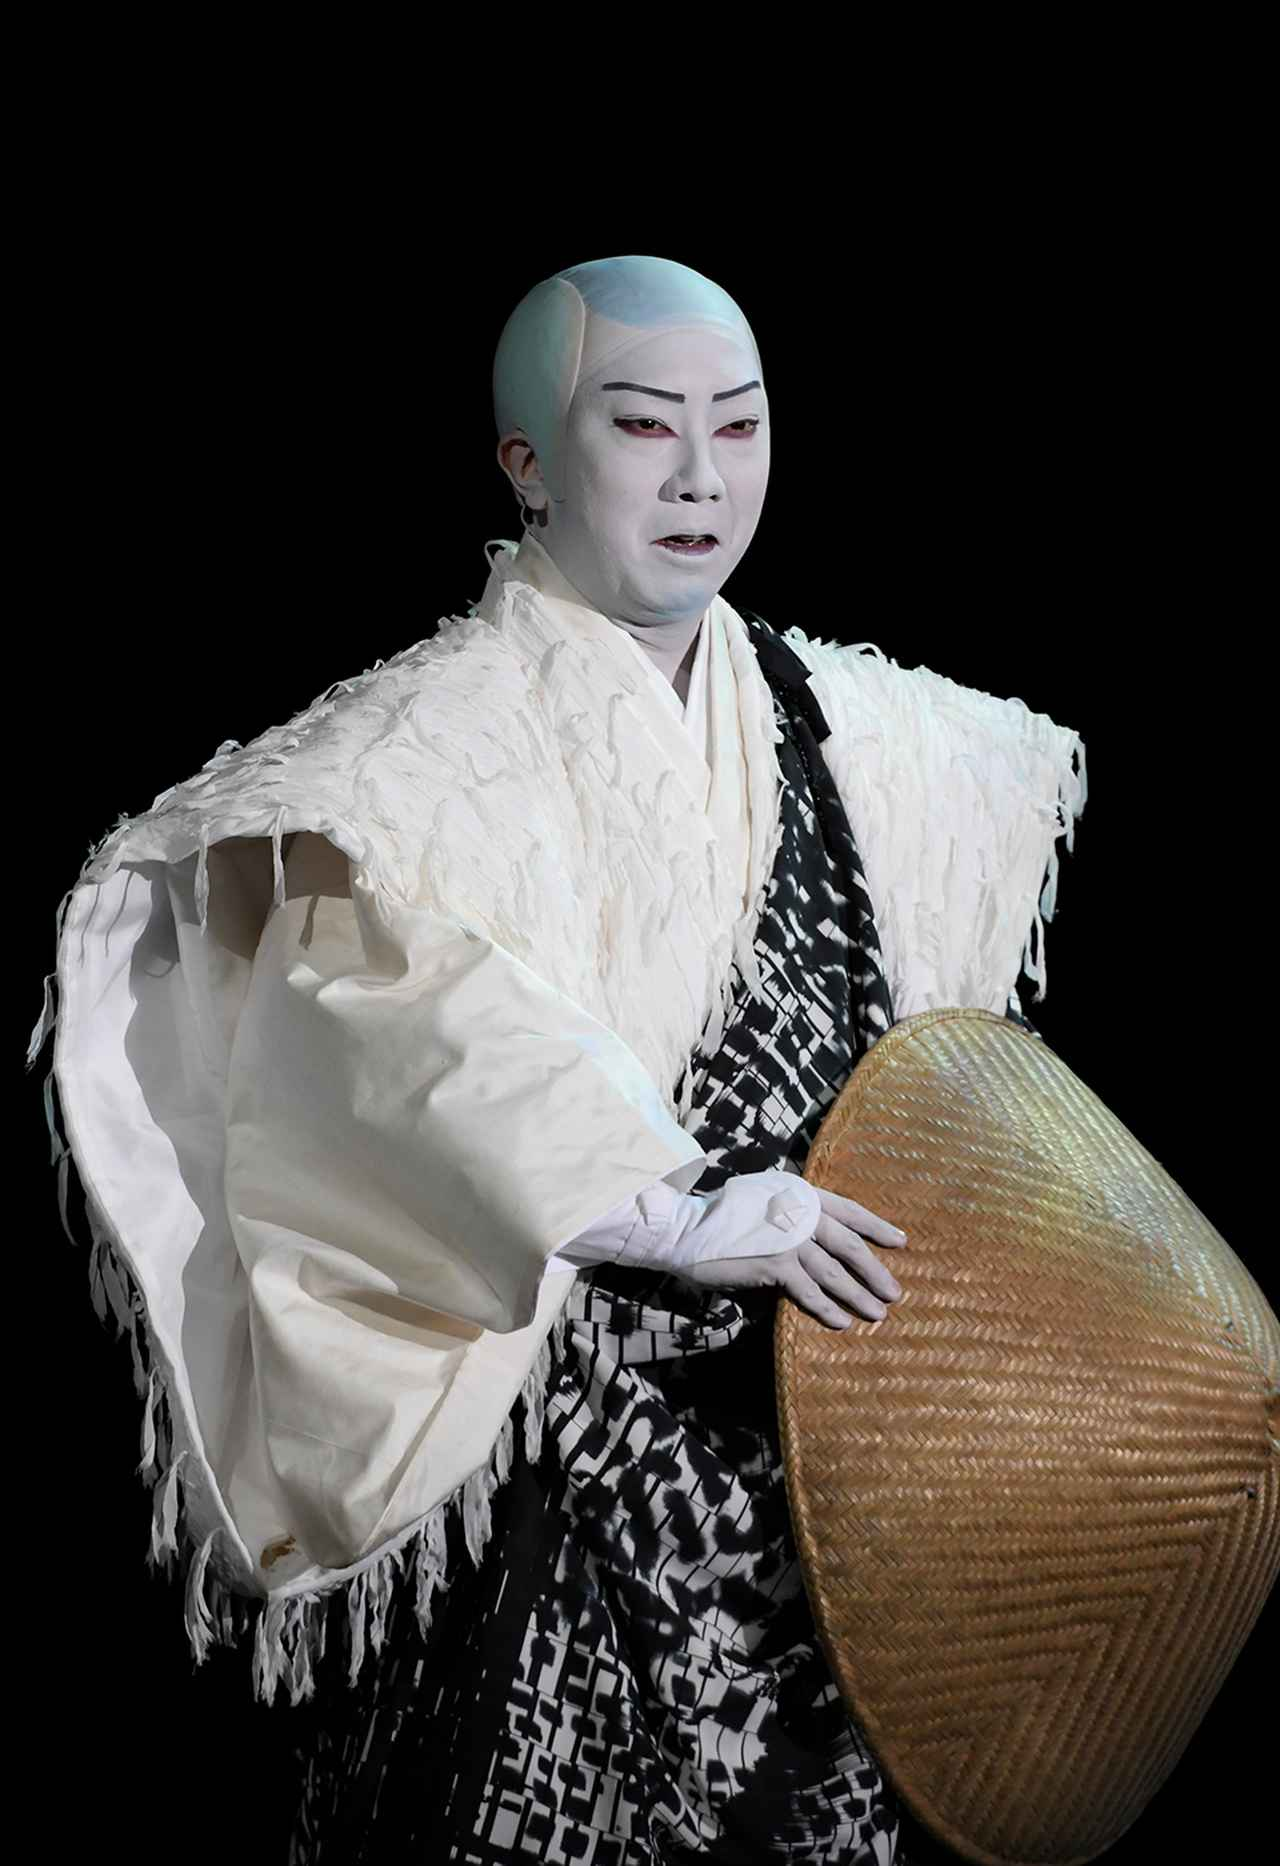 Images : 5番目の画像 - 「「歌舞伎への扉」Vol.8 古典を咀嚼し、新たな道を拓く。 ーー「スーパー歌舞伎Ⅱ」で 市川猿之助が目指すもの」のアルバム - T JAPAN:The New York Times Style Magazine 公式サイト